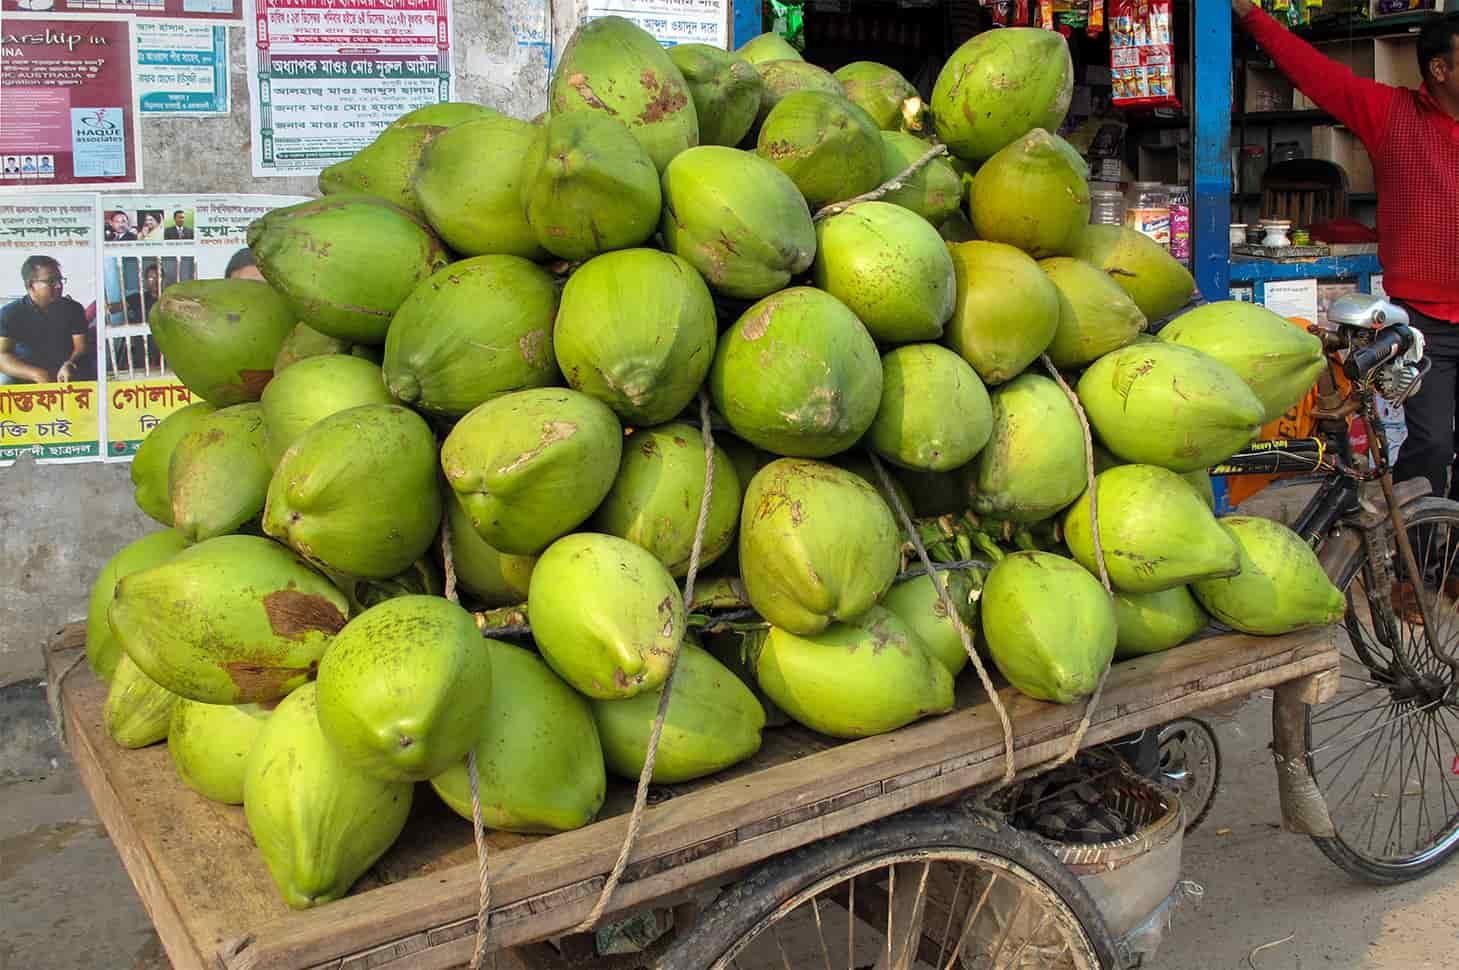 selling coconut husks